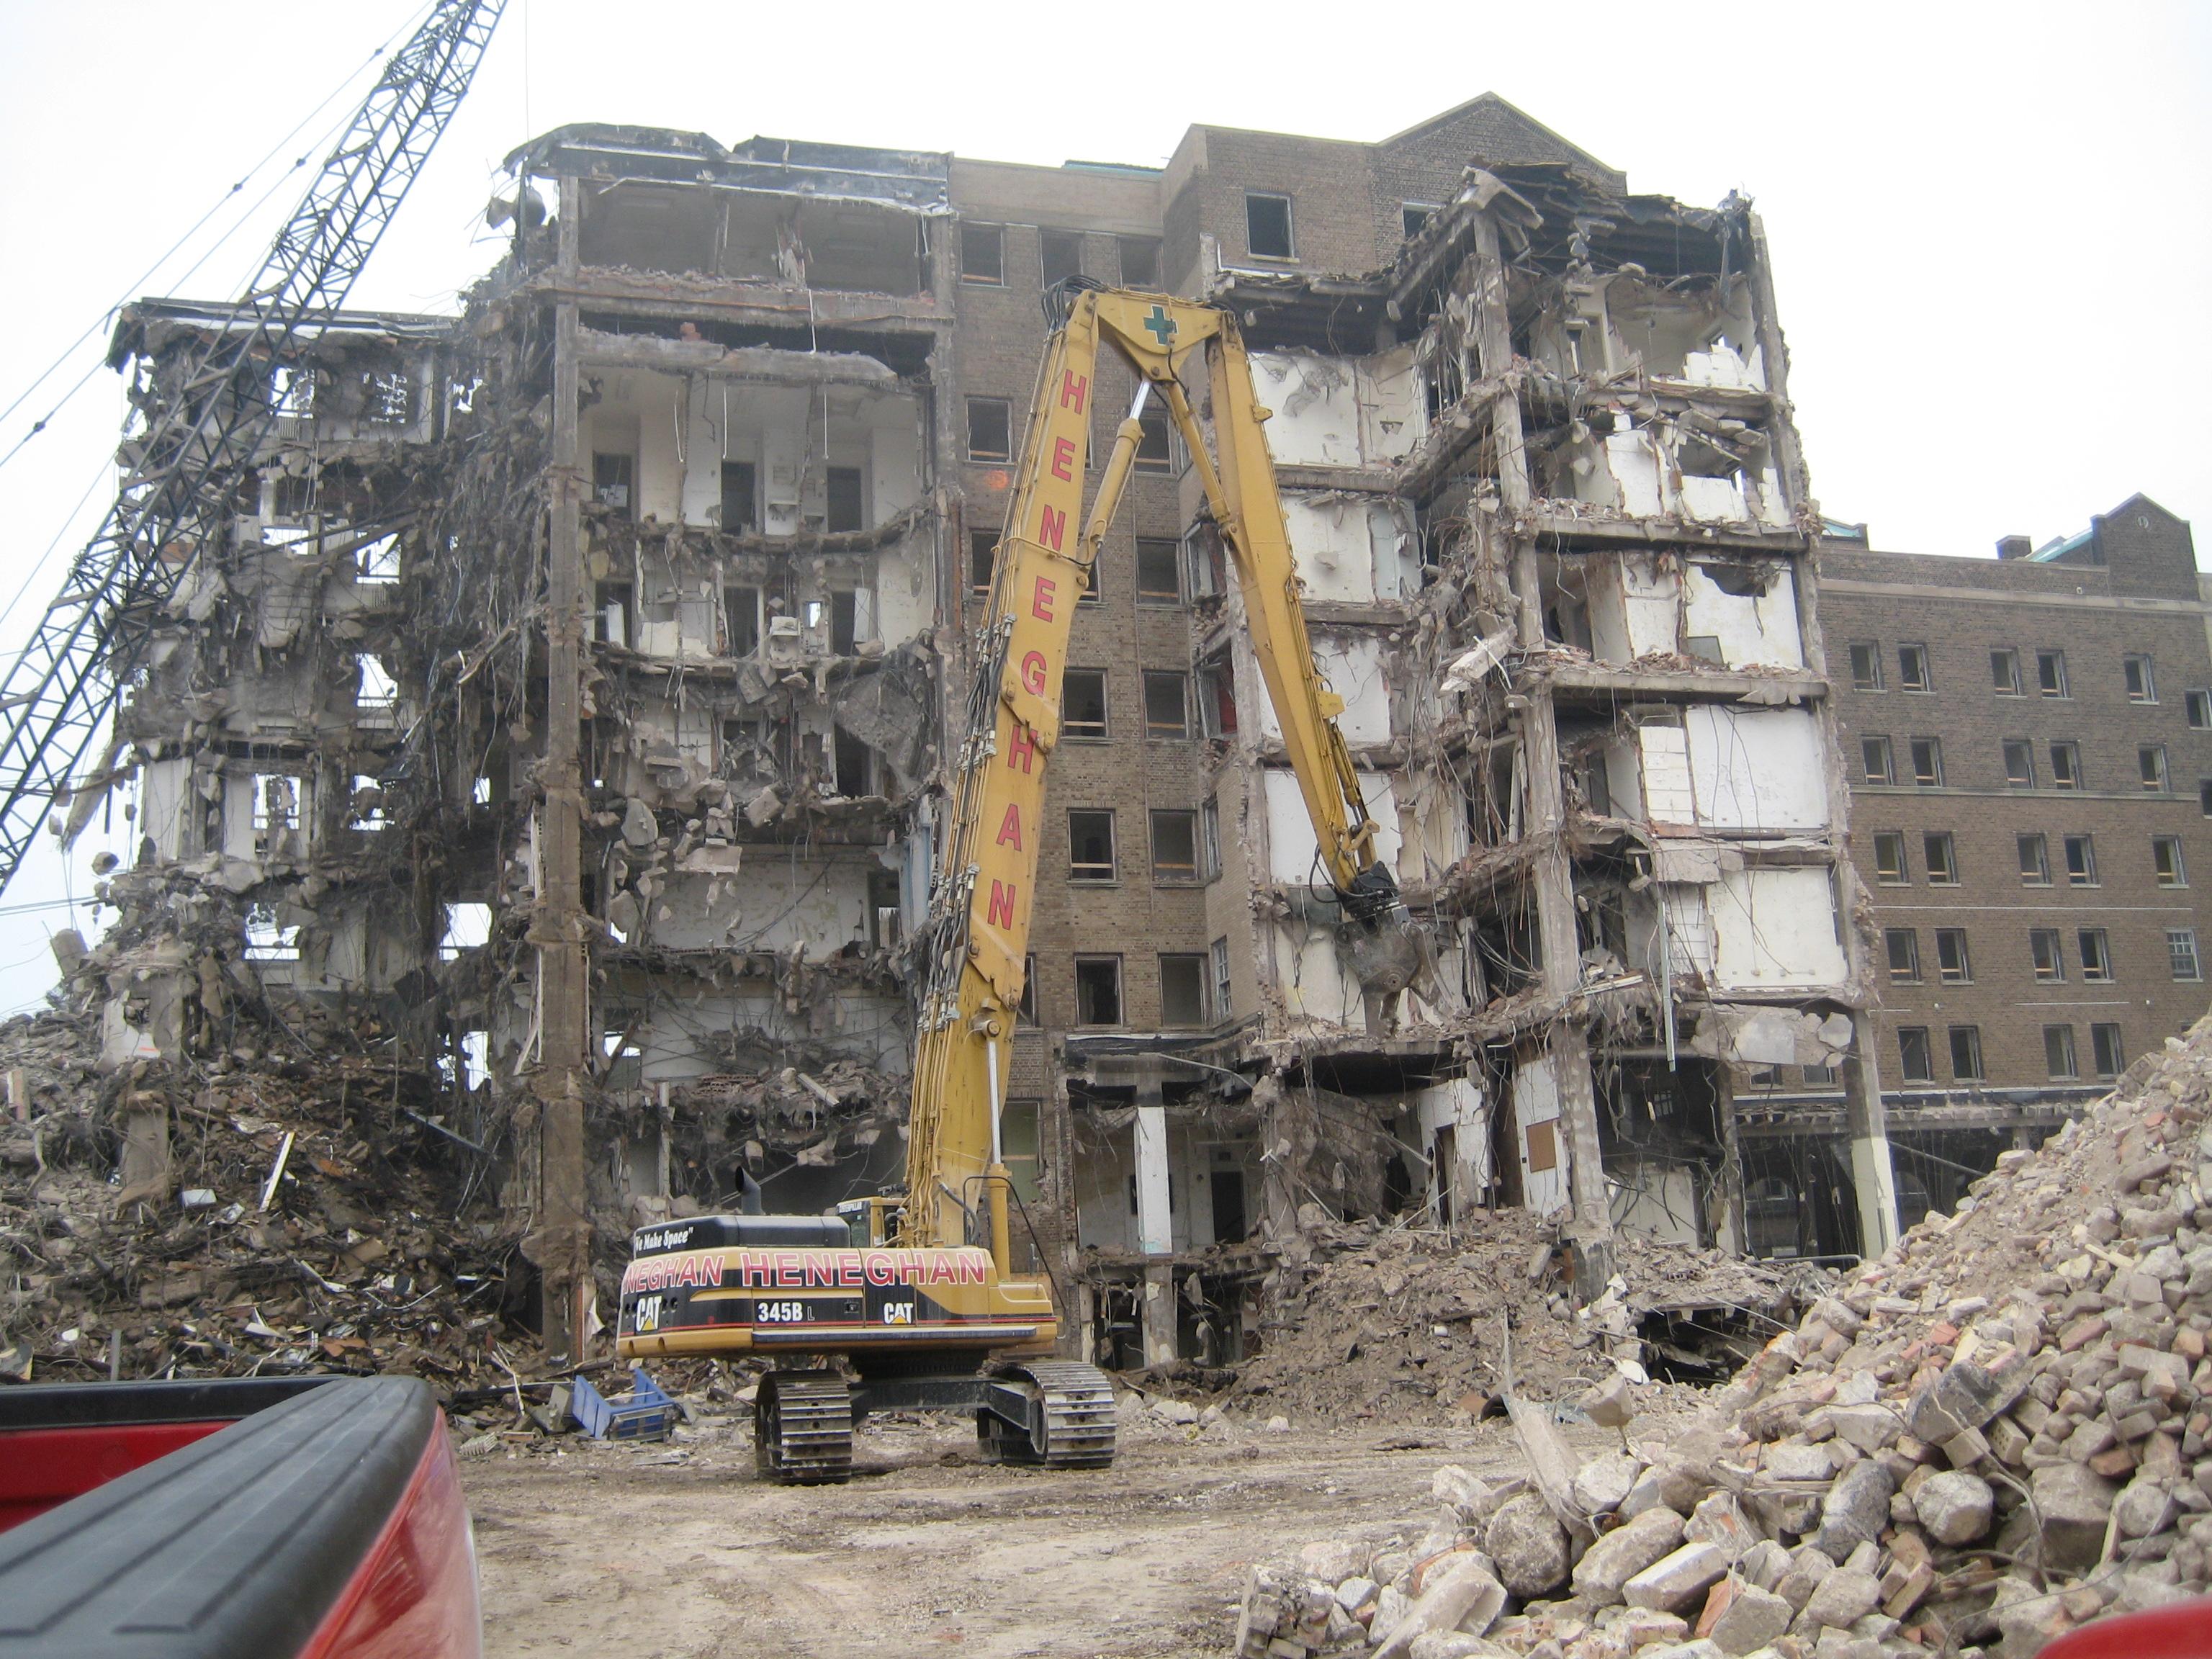 Michael Reese Hospital, healthcare demolition